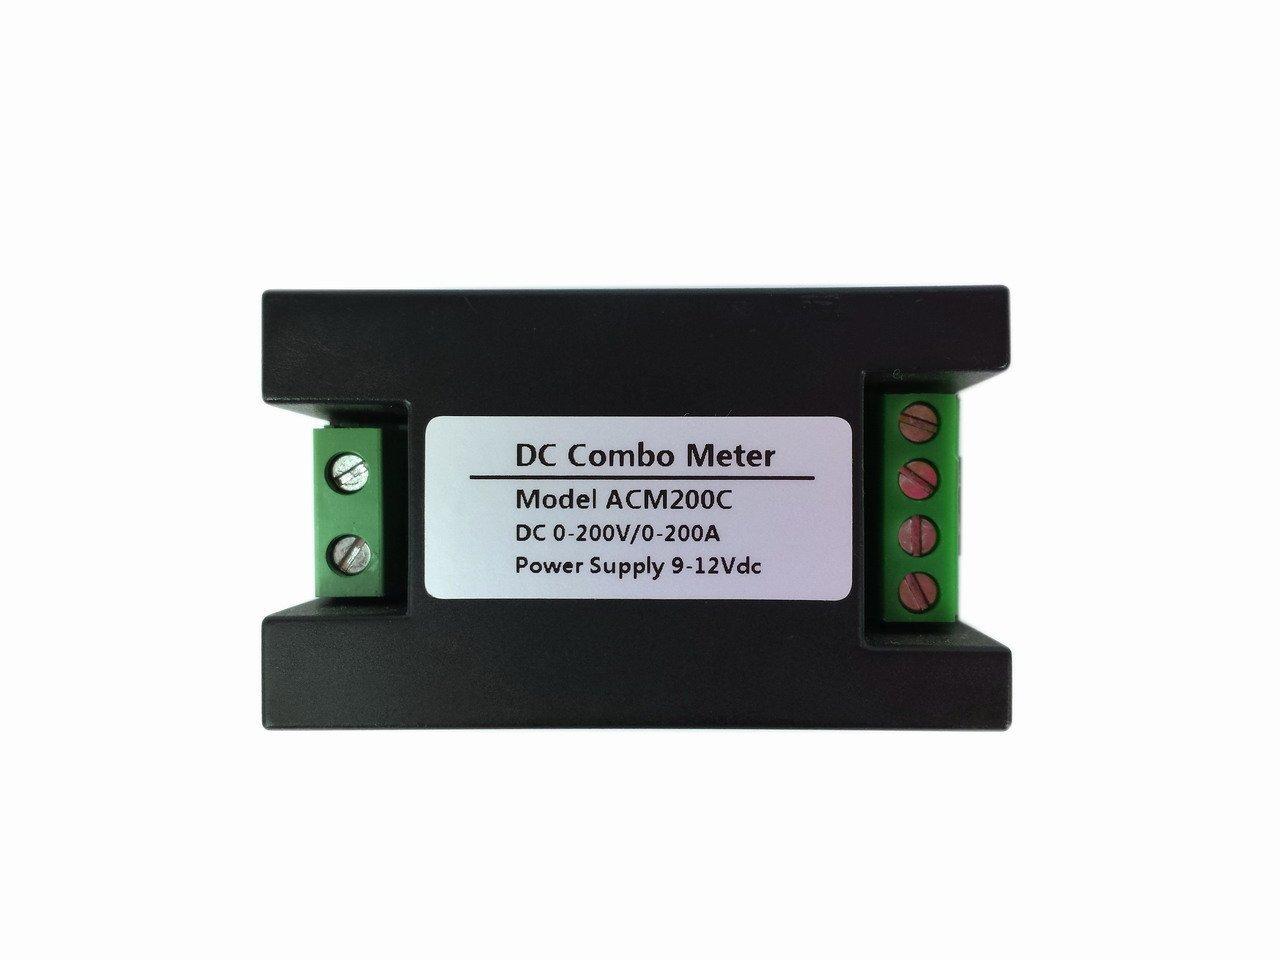 Aili Dc 20v 100a Voltage Current Meter 12v Caravan 4wd Rv Boat Rc Watt Power Balancer Battery Analyze Solar Wind Hho